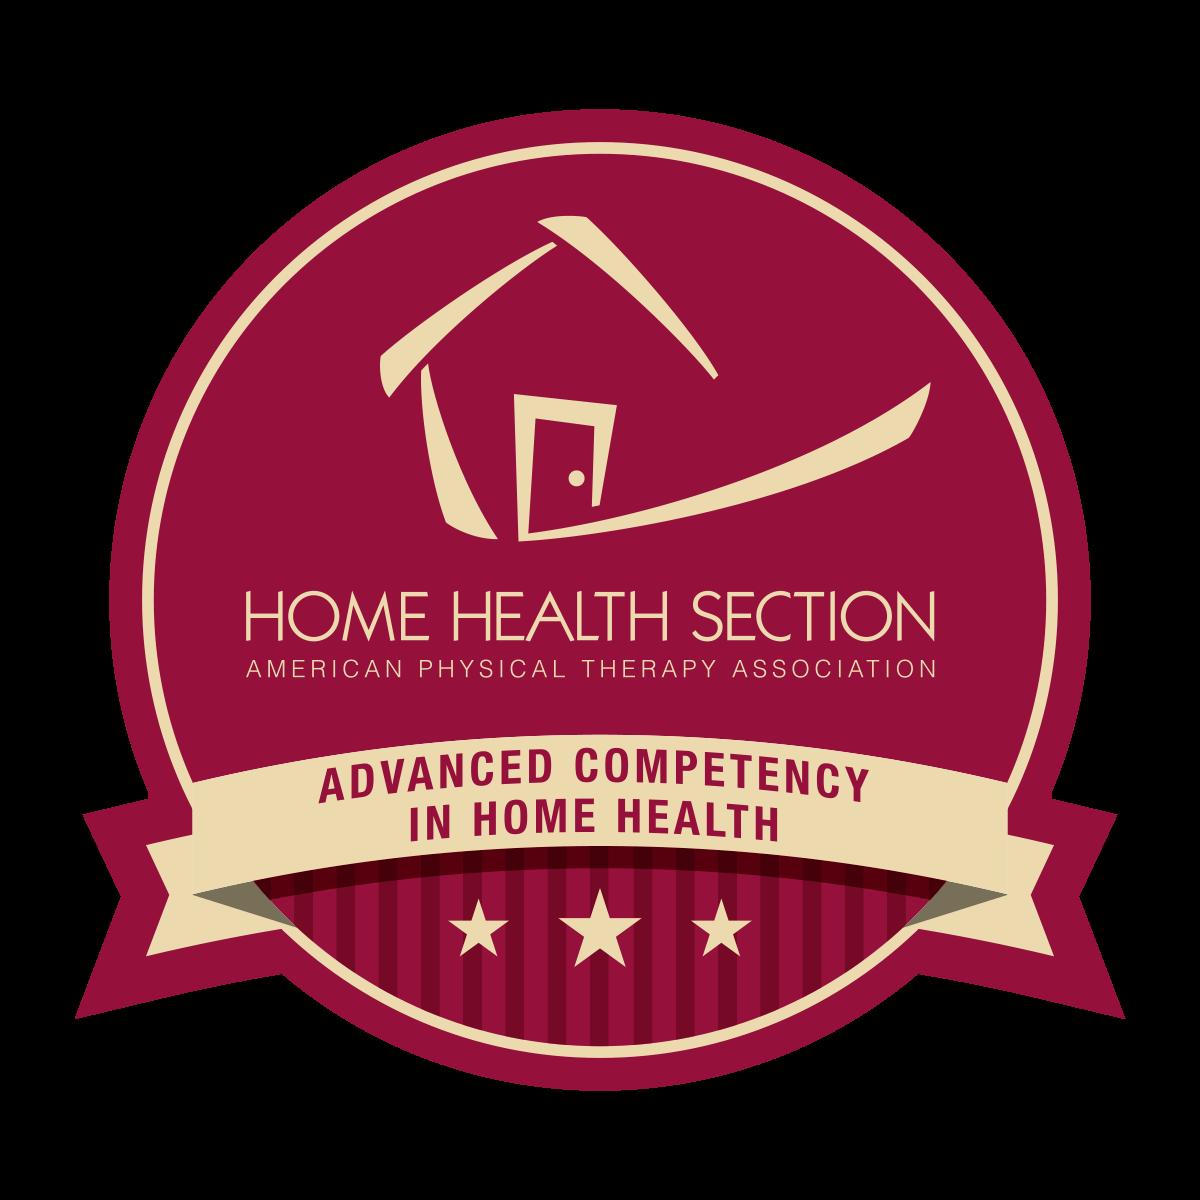 Apta Home Health Badge